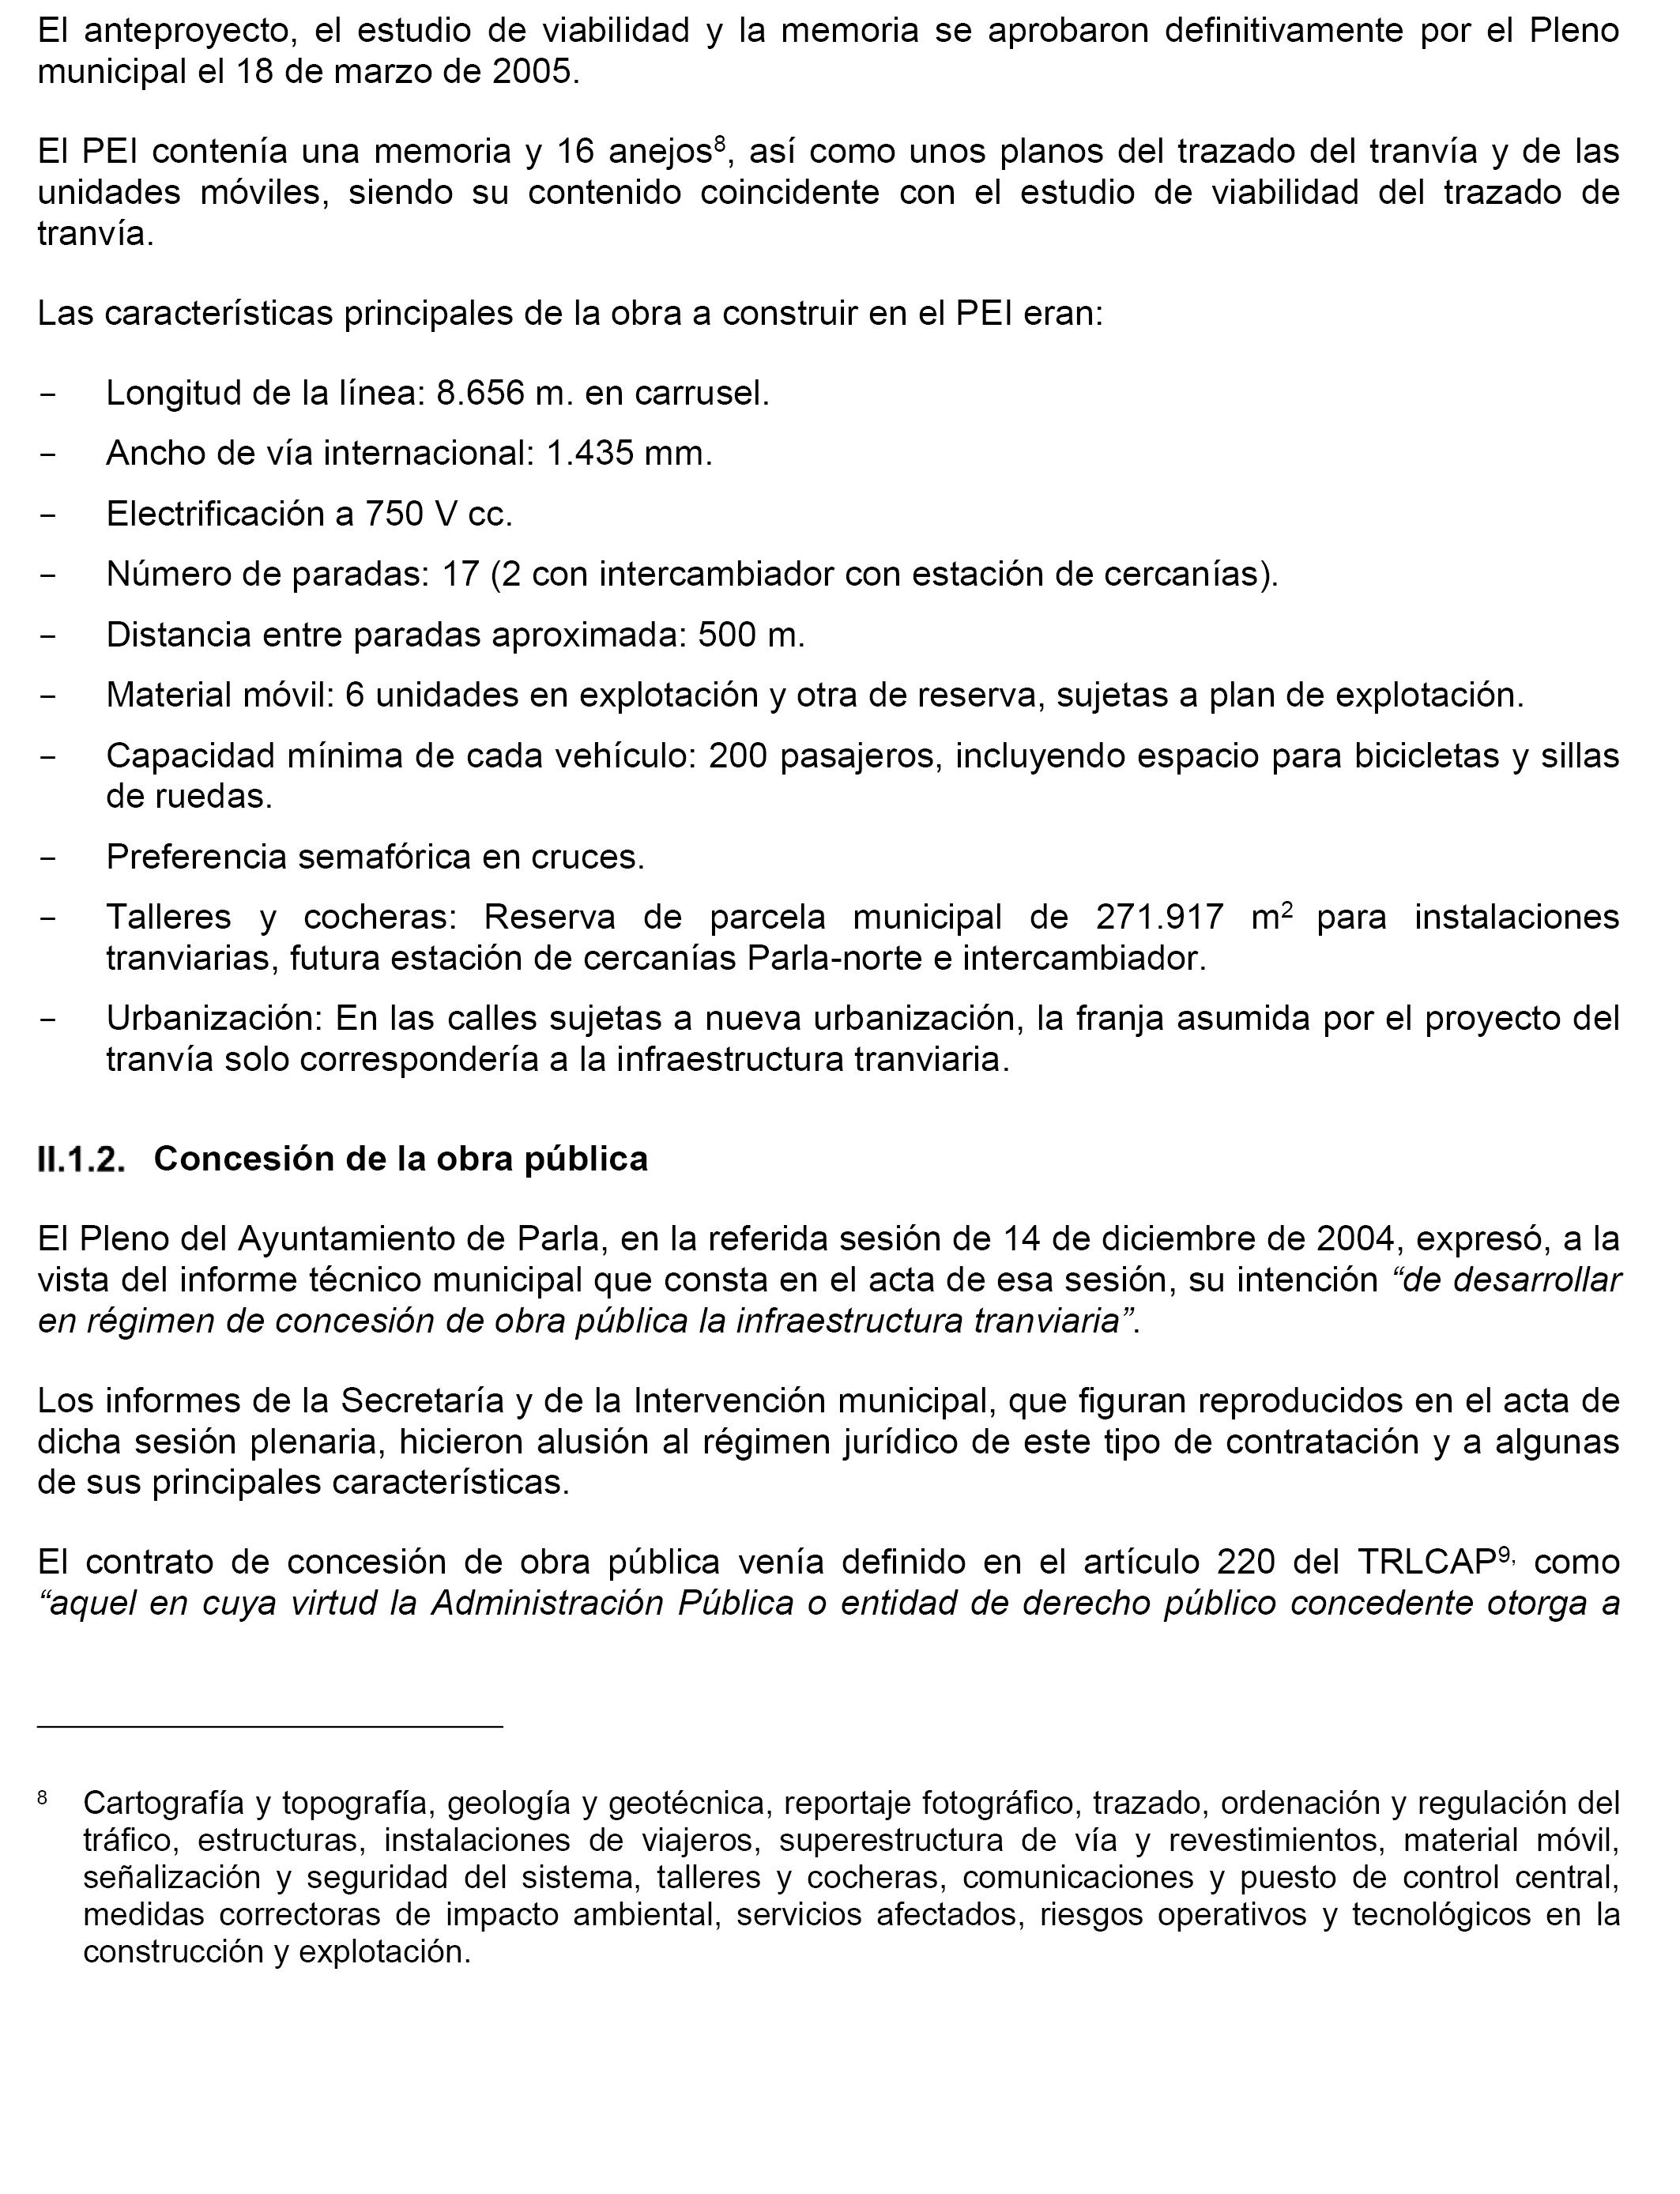 BOE.es - Documento BOE-A-2017-14506